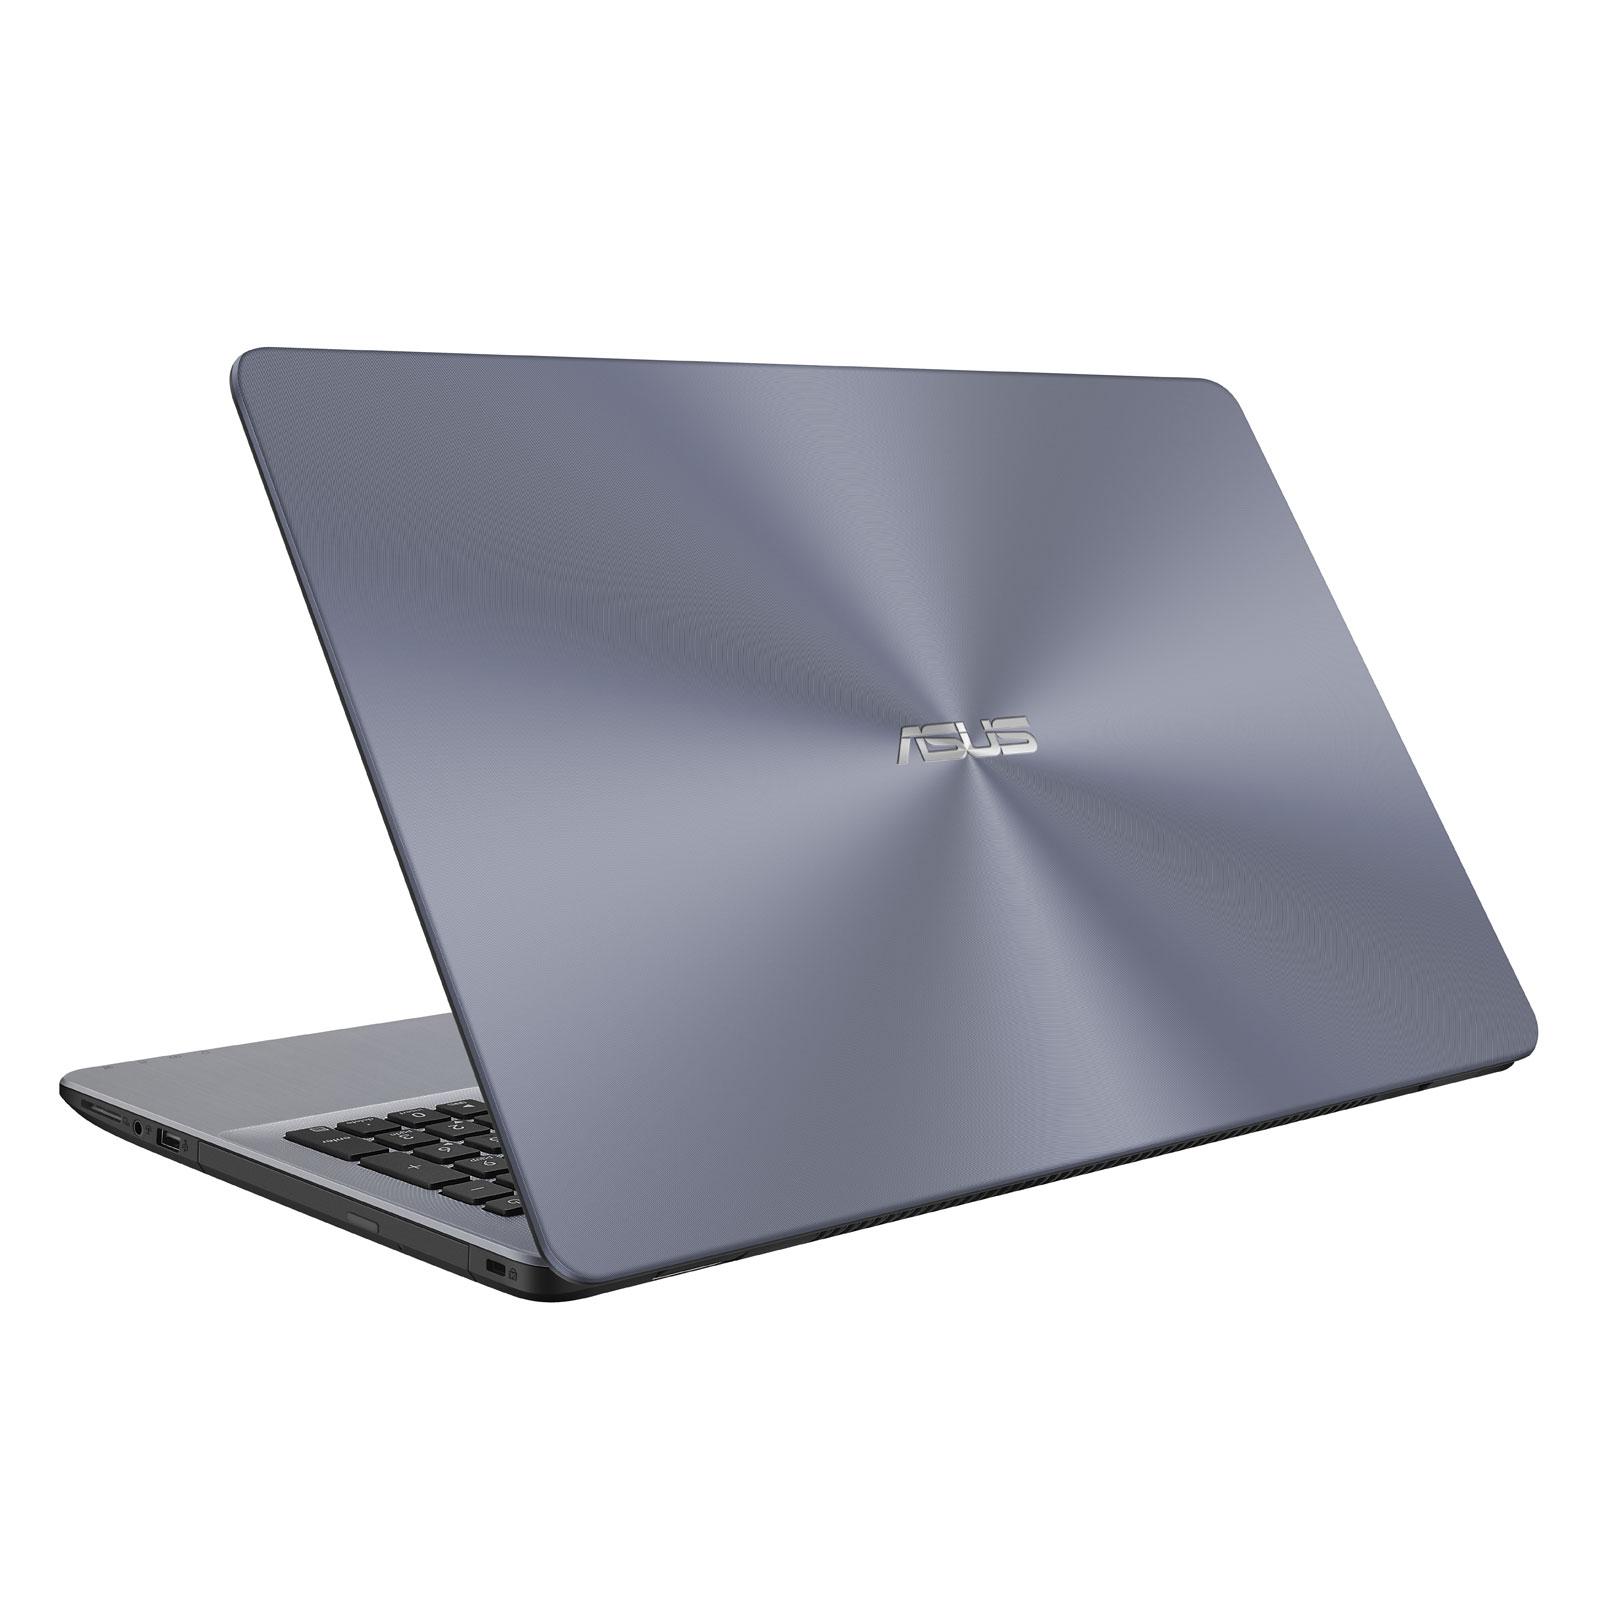 ASUS P15 P1501UA-GQ502R (90NB0F22-M06620) - Achat / Vente PC portable sur Picata.fr - 1